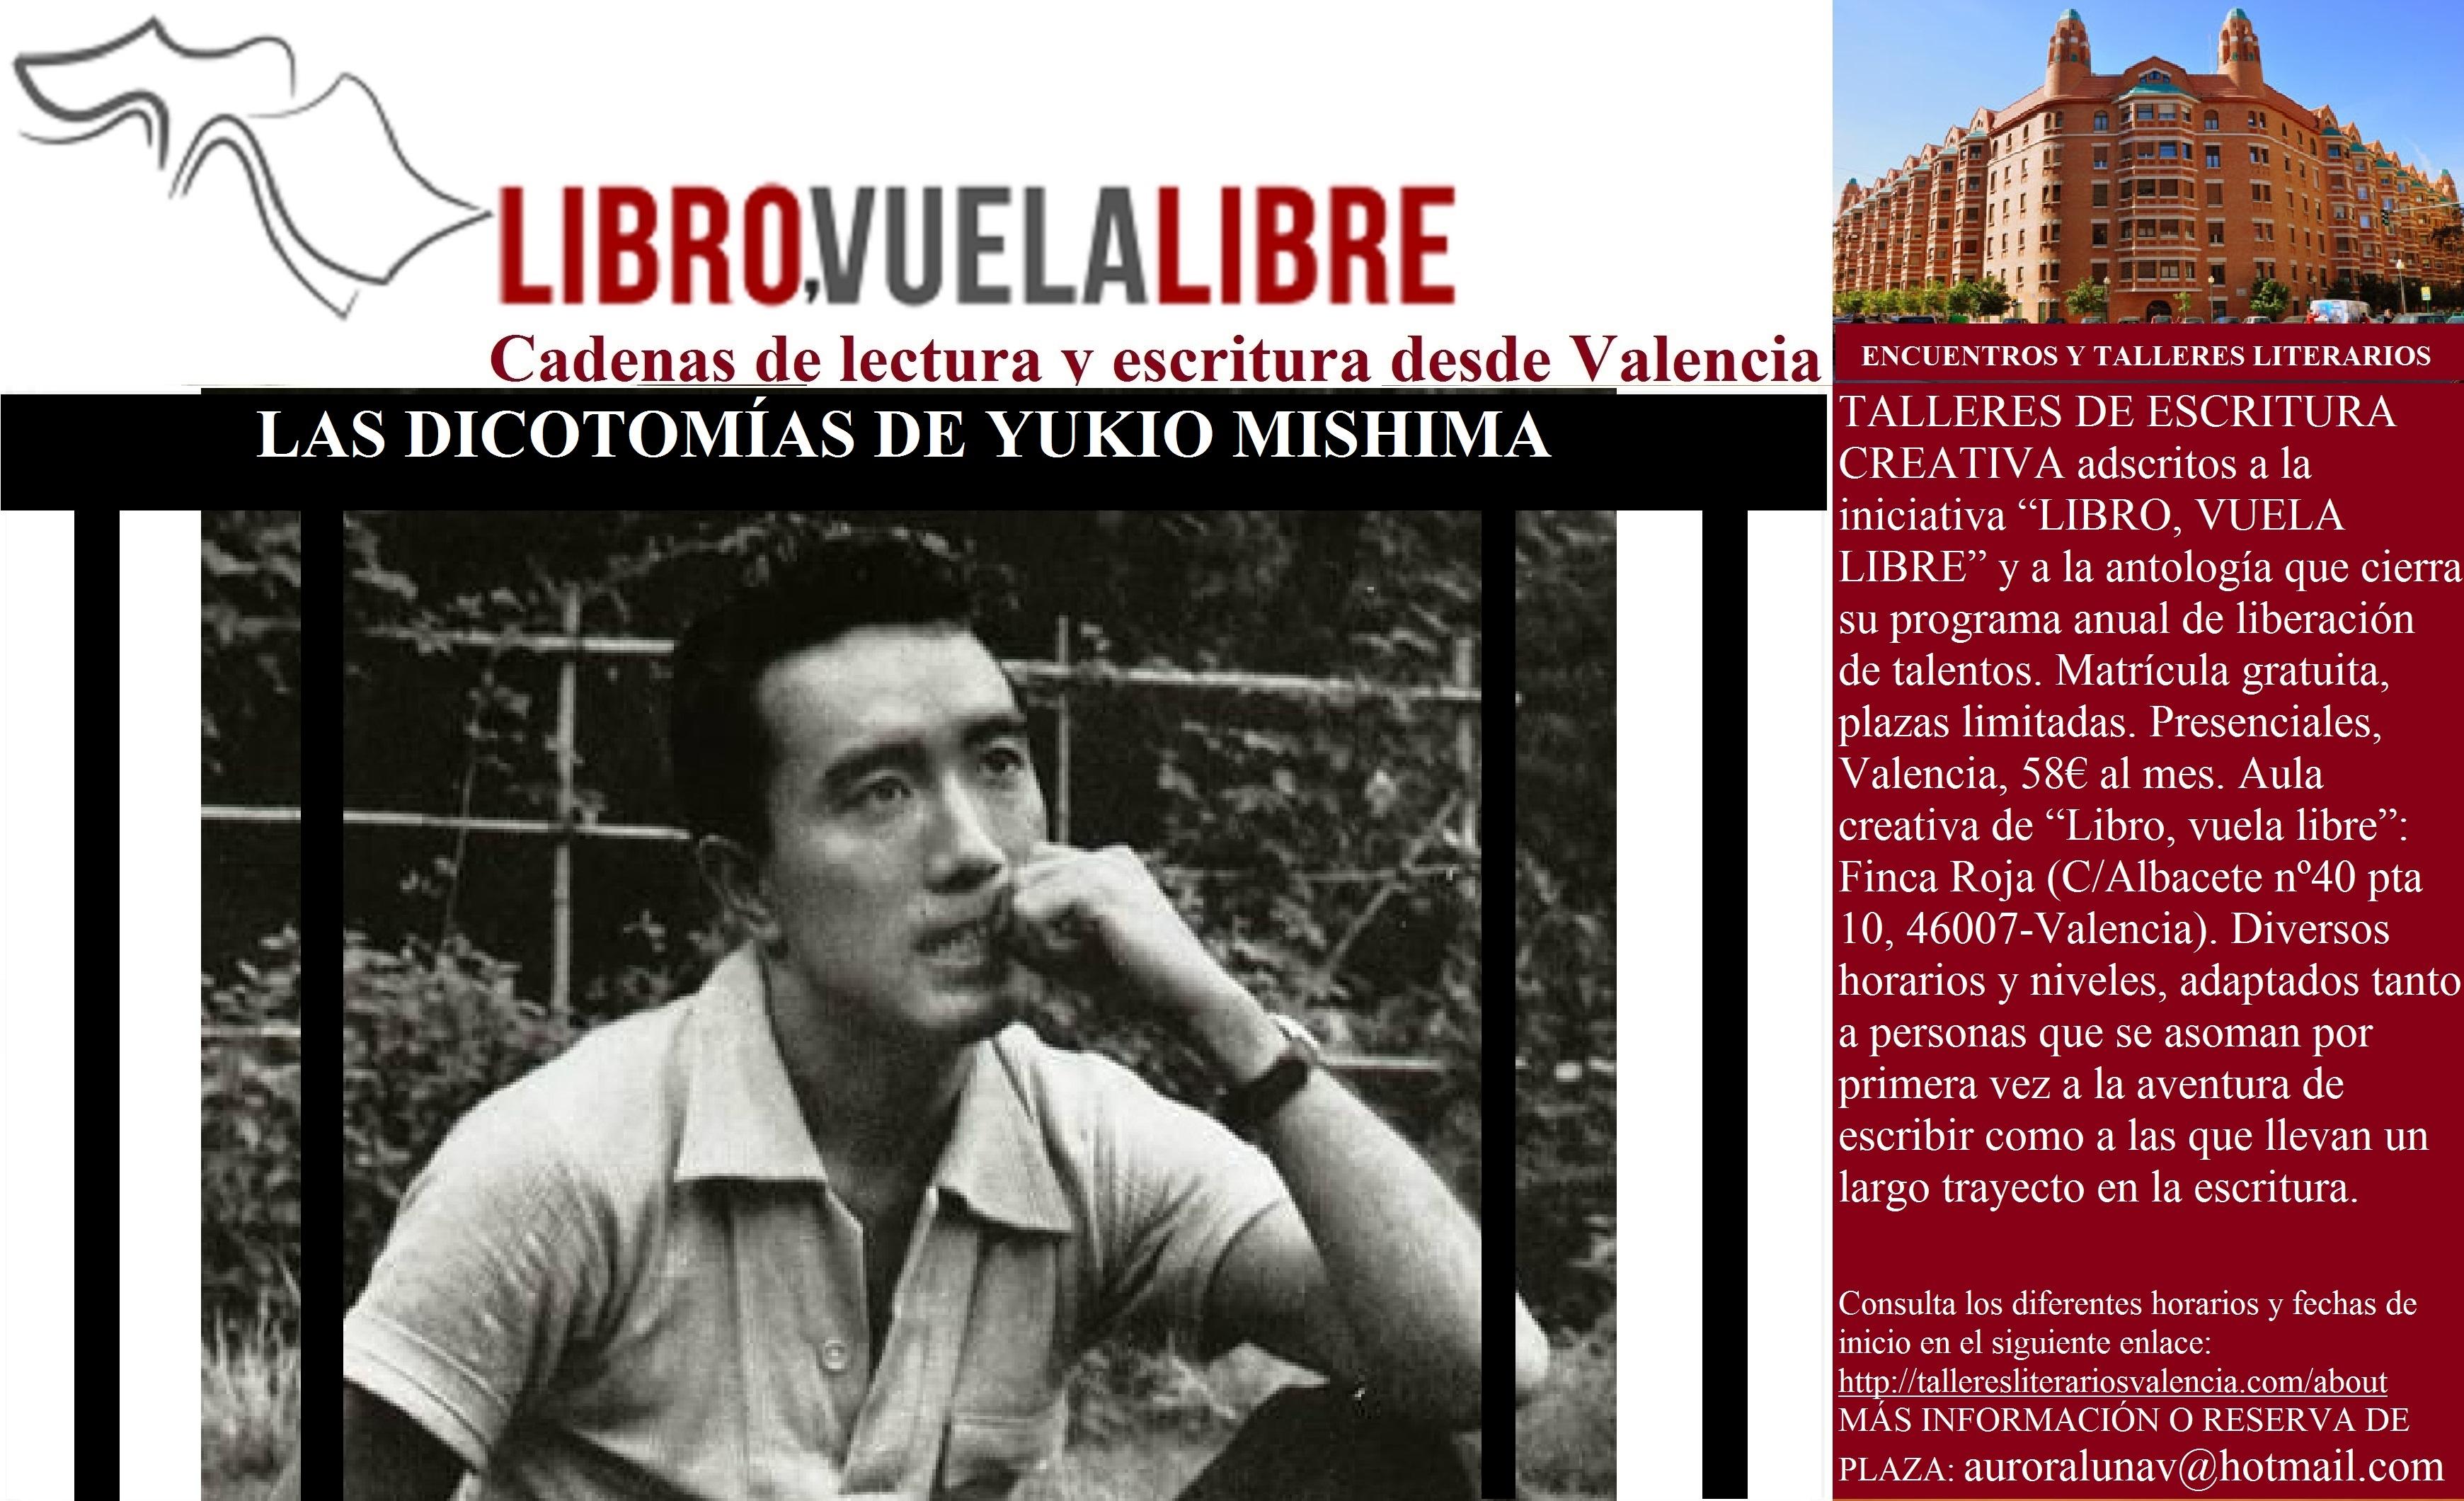 LAS DICOTOMÍAS DE MISHIMA. Talleres de escritura en Valencia de LIBRO, VUELA LIBRE. Clave 49